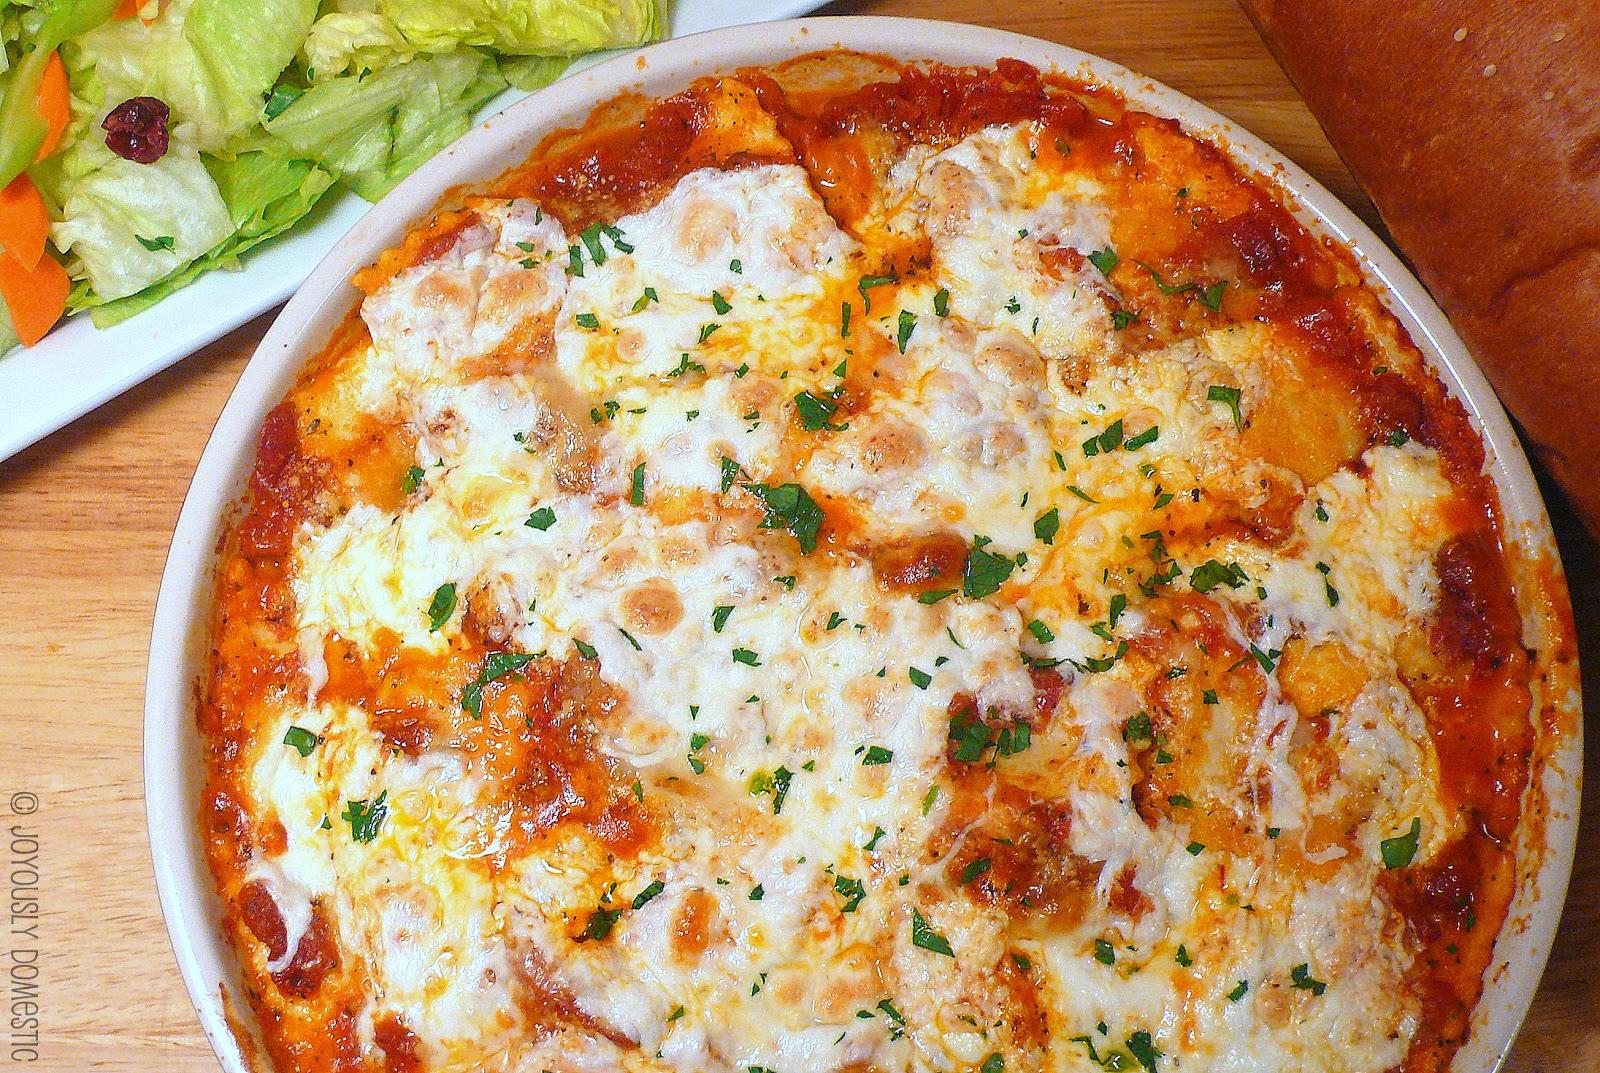 Joyously Domestic: Cheesy Ravioli Bake